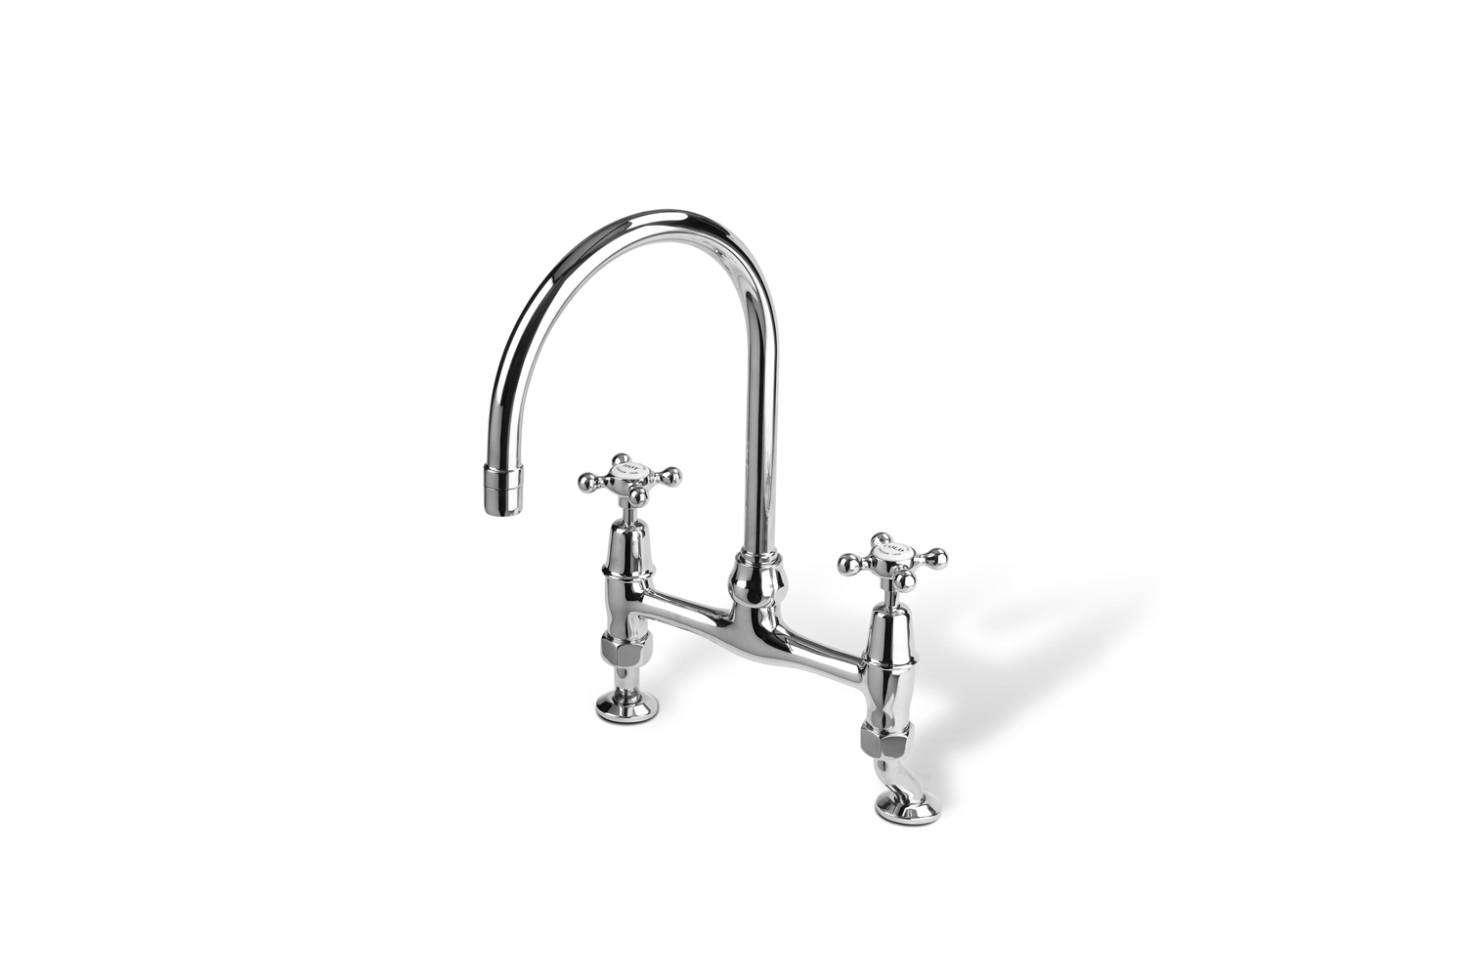 HighLow Bridge Faucets Remodelista